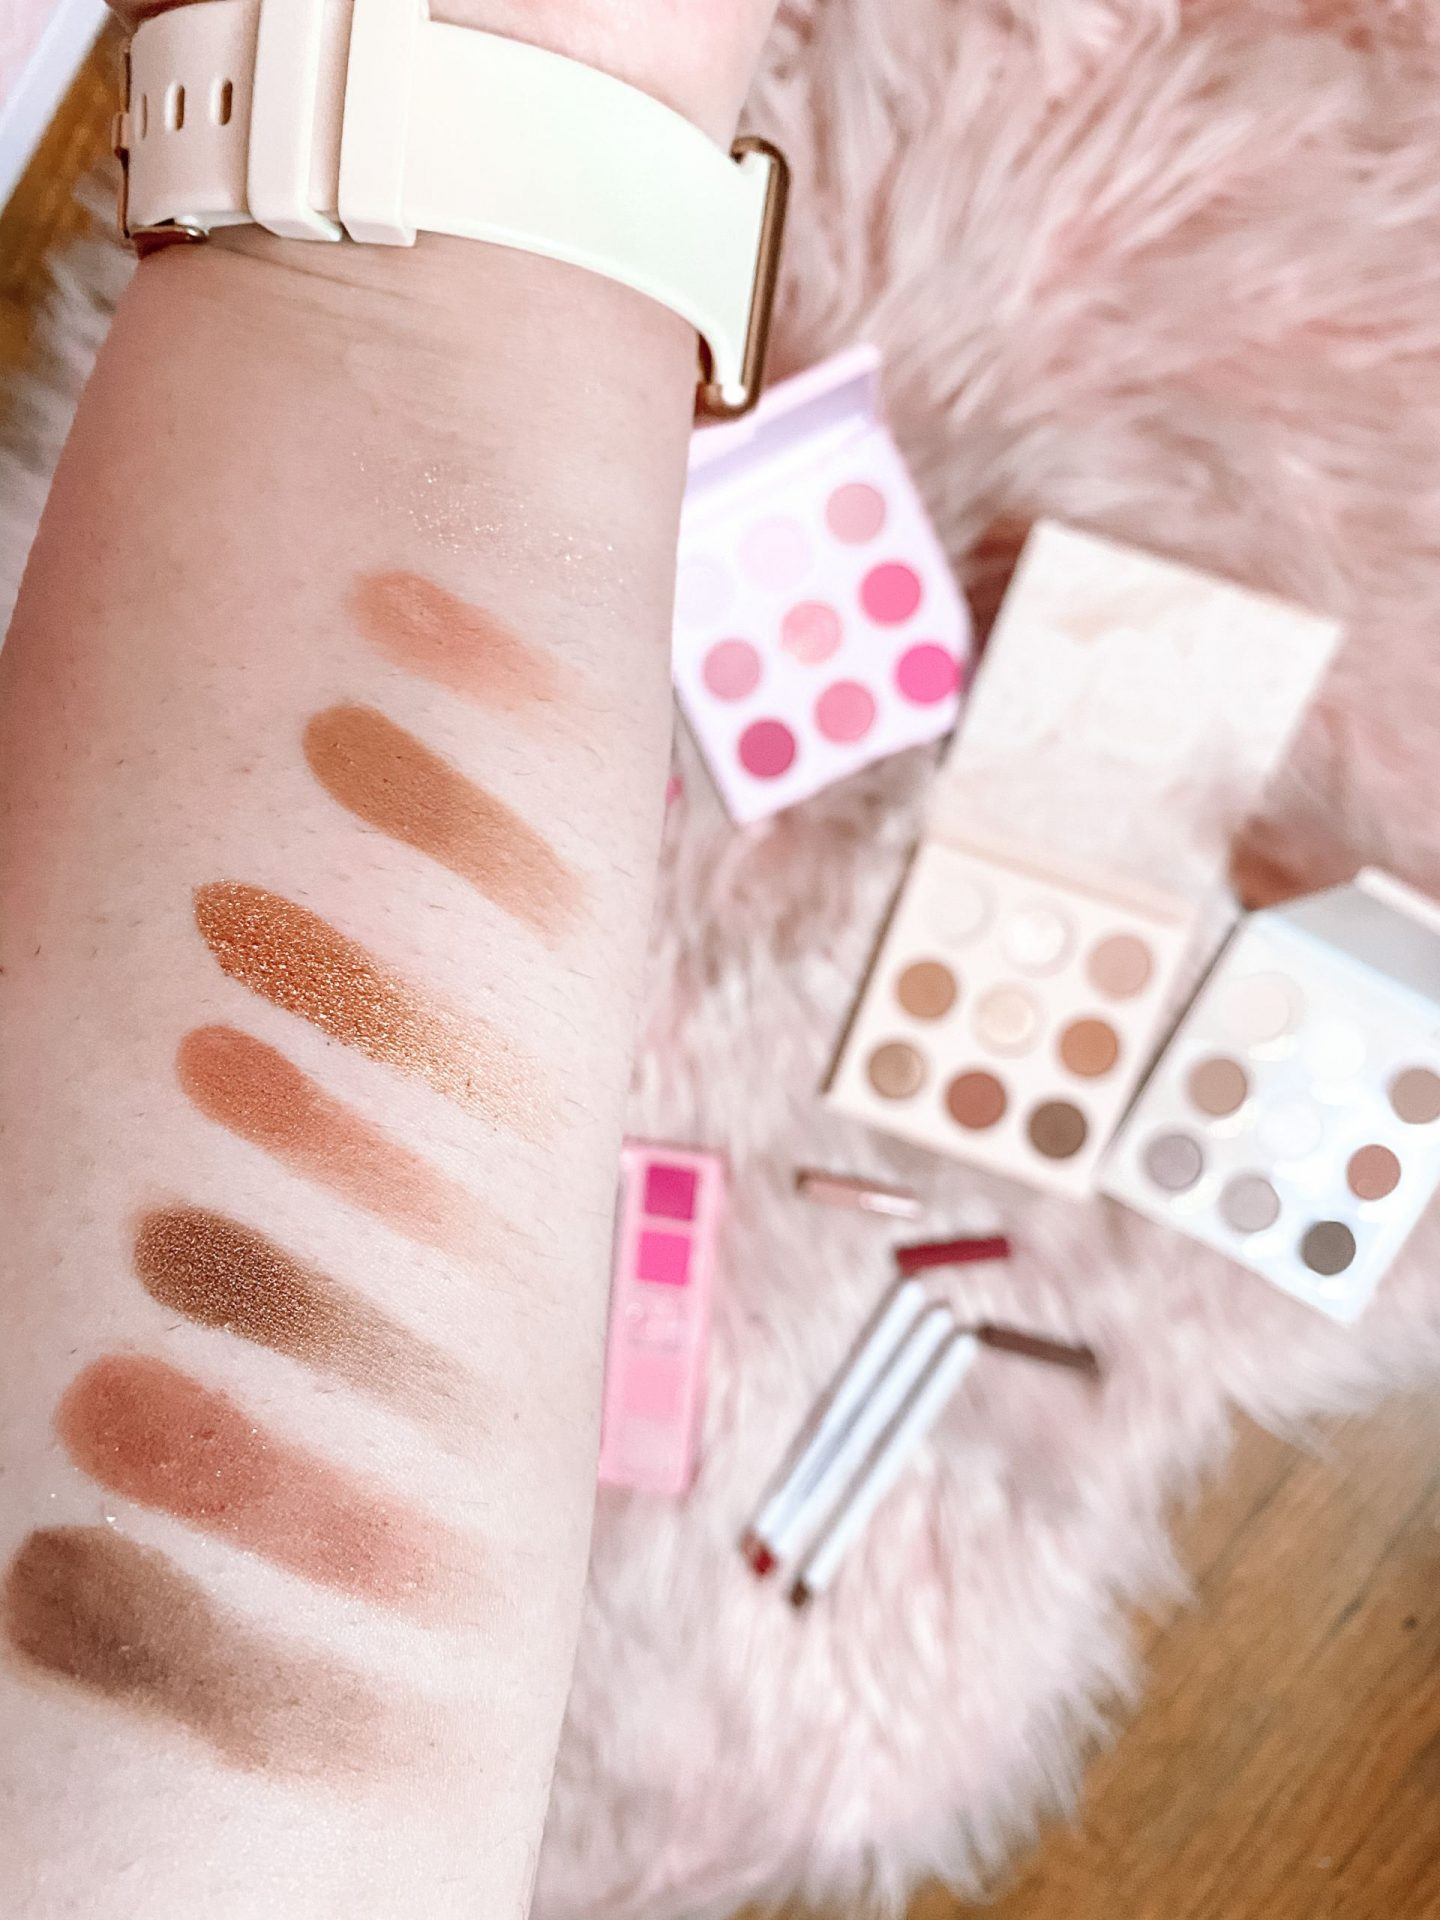 Colourpop Haul & Eyeshadow Looks